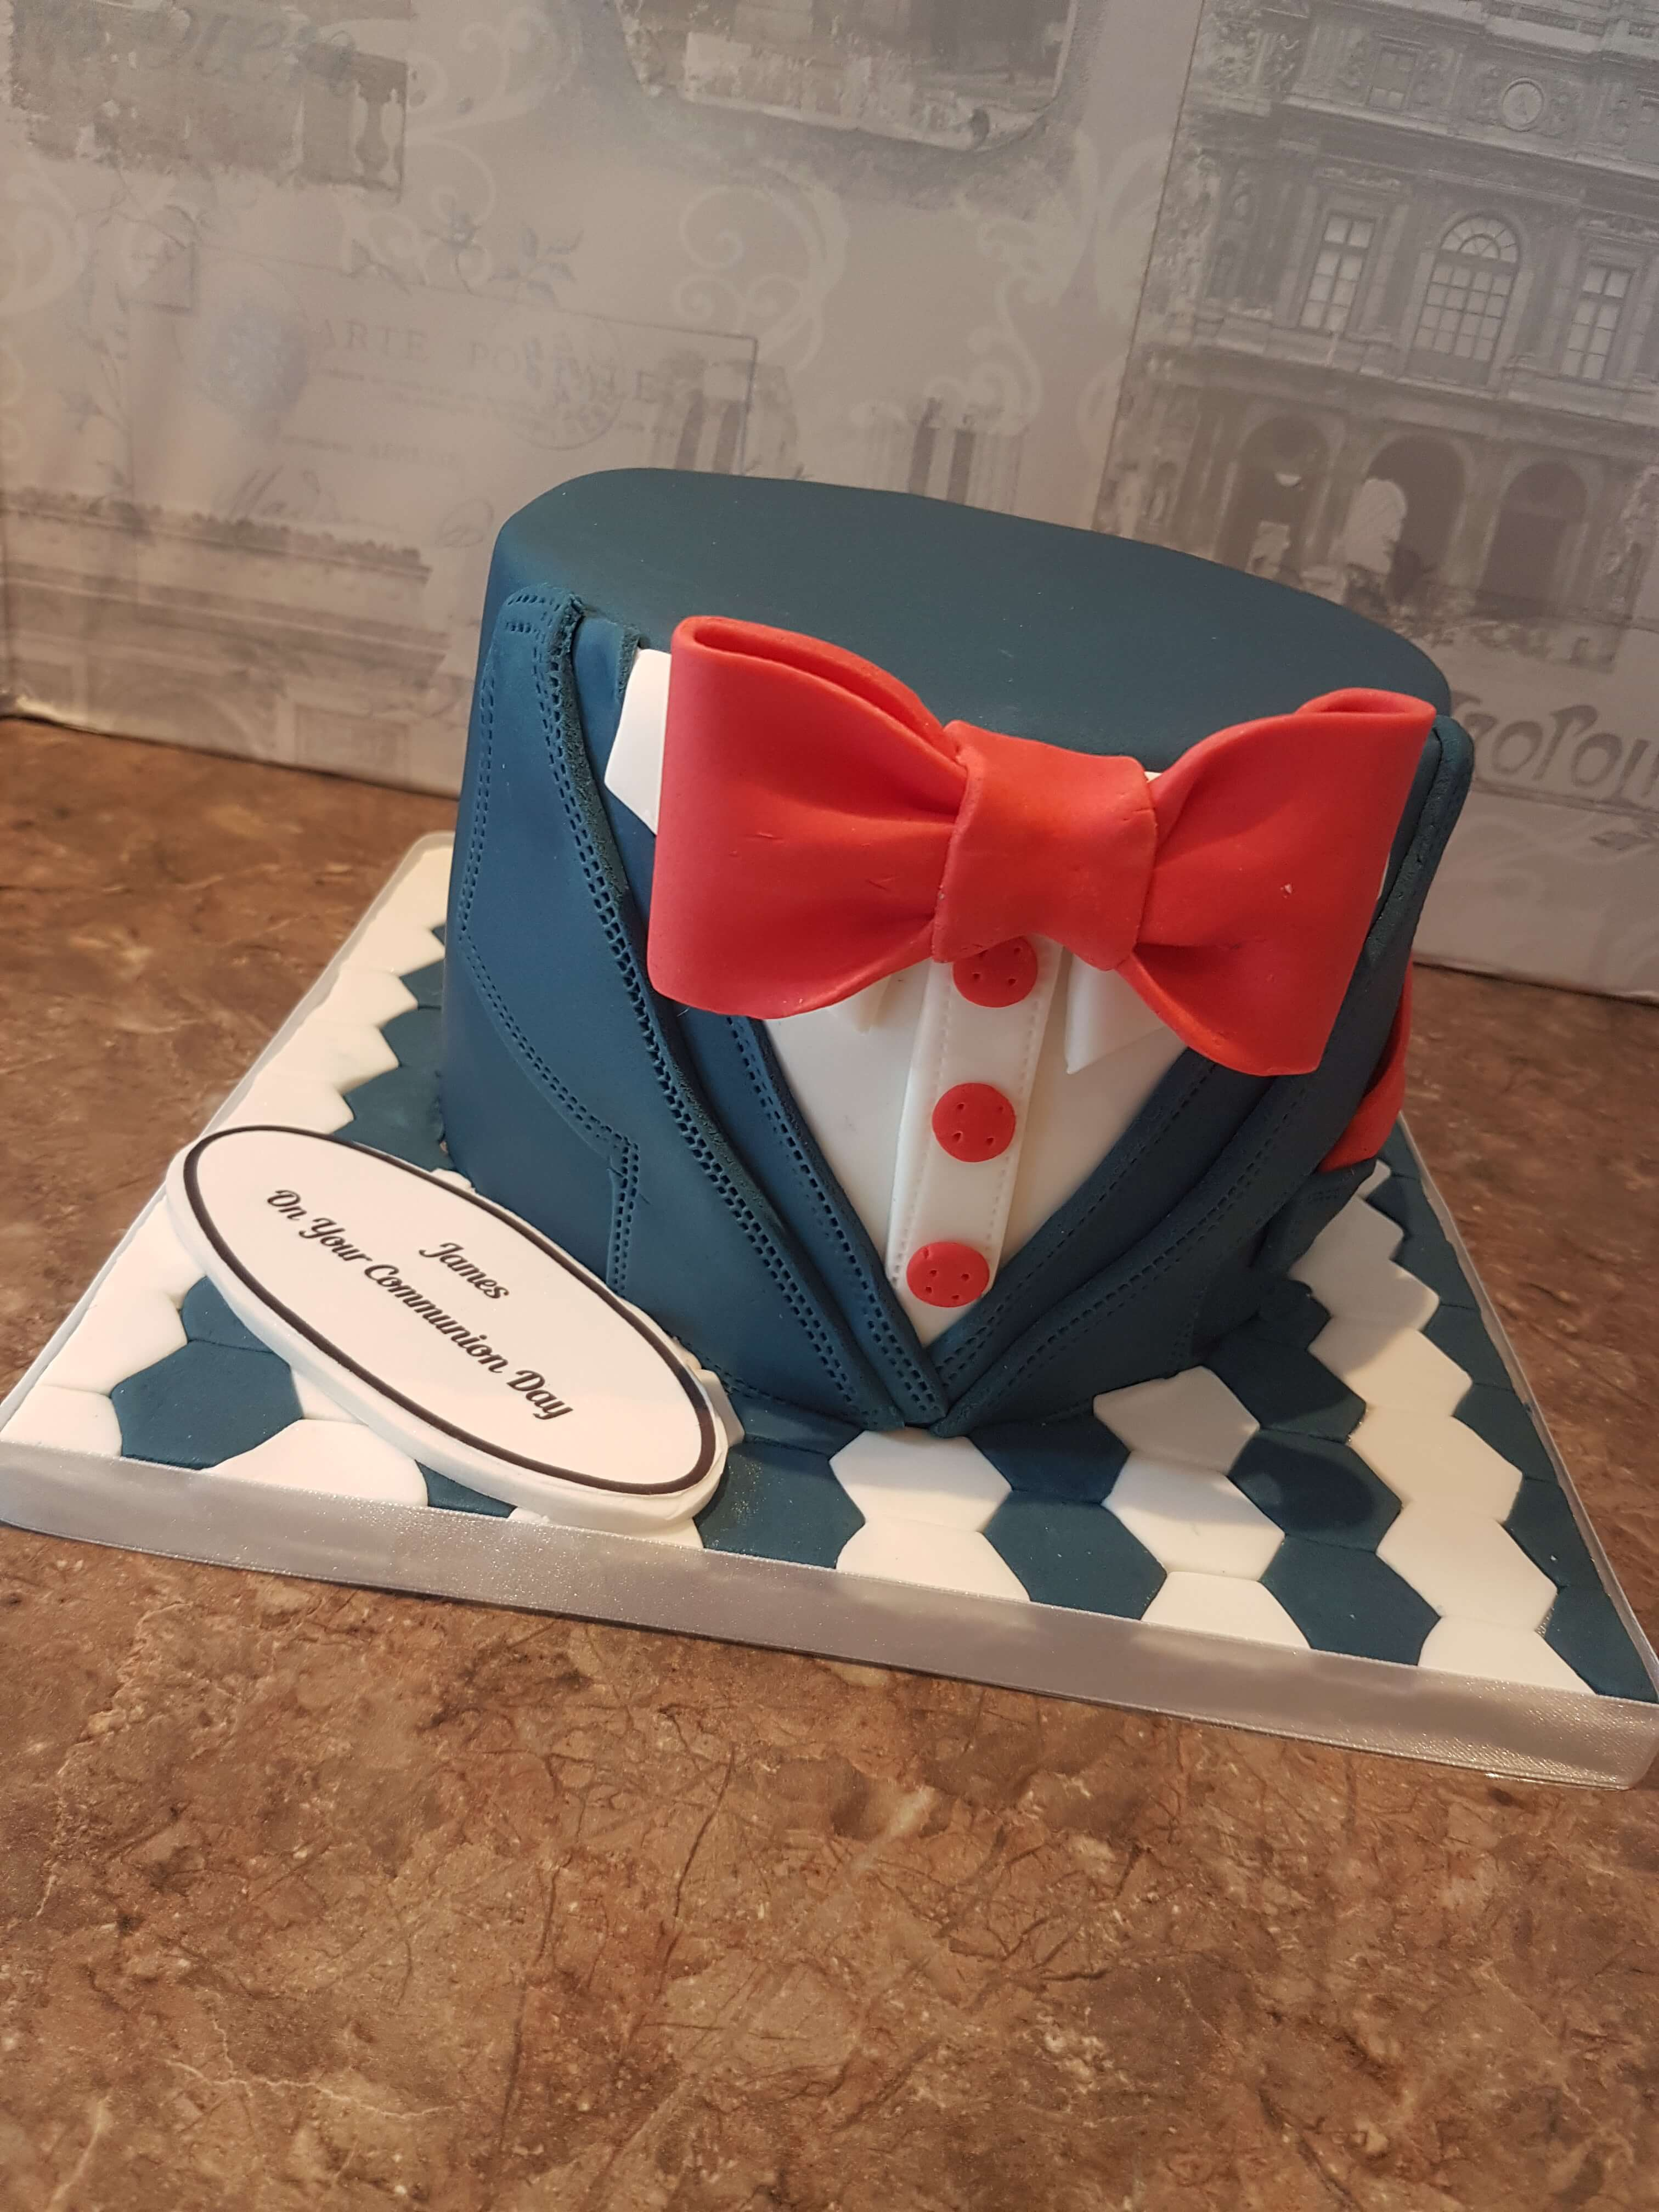 Dapper Communion Cake